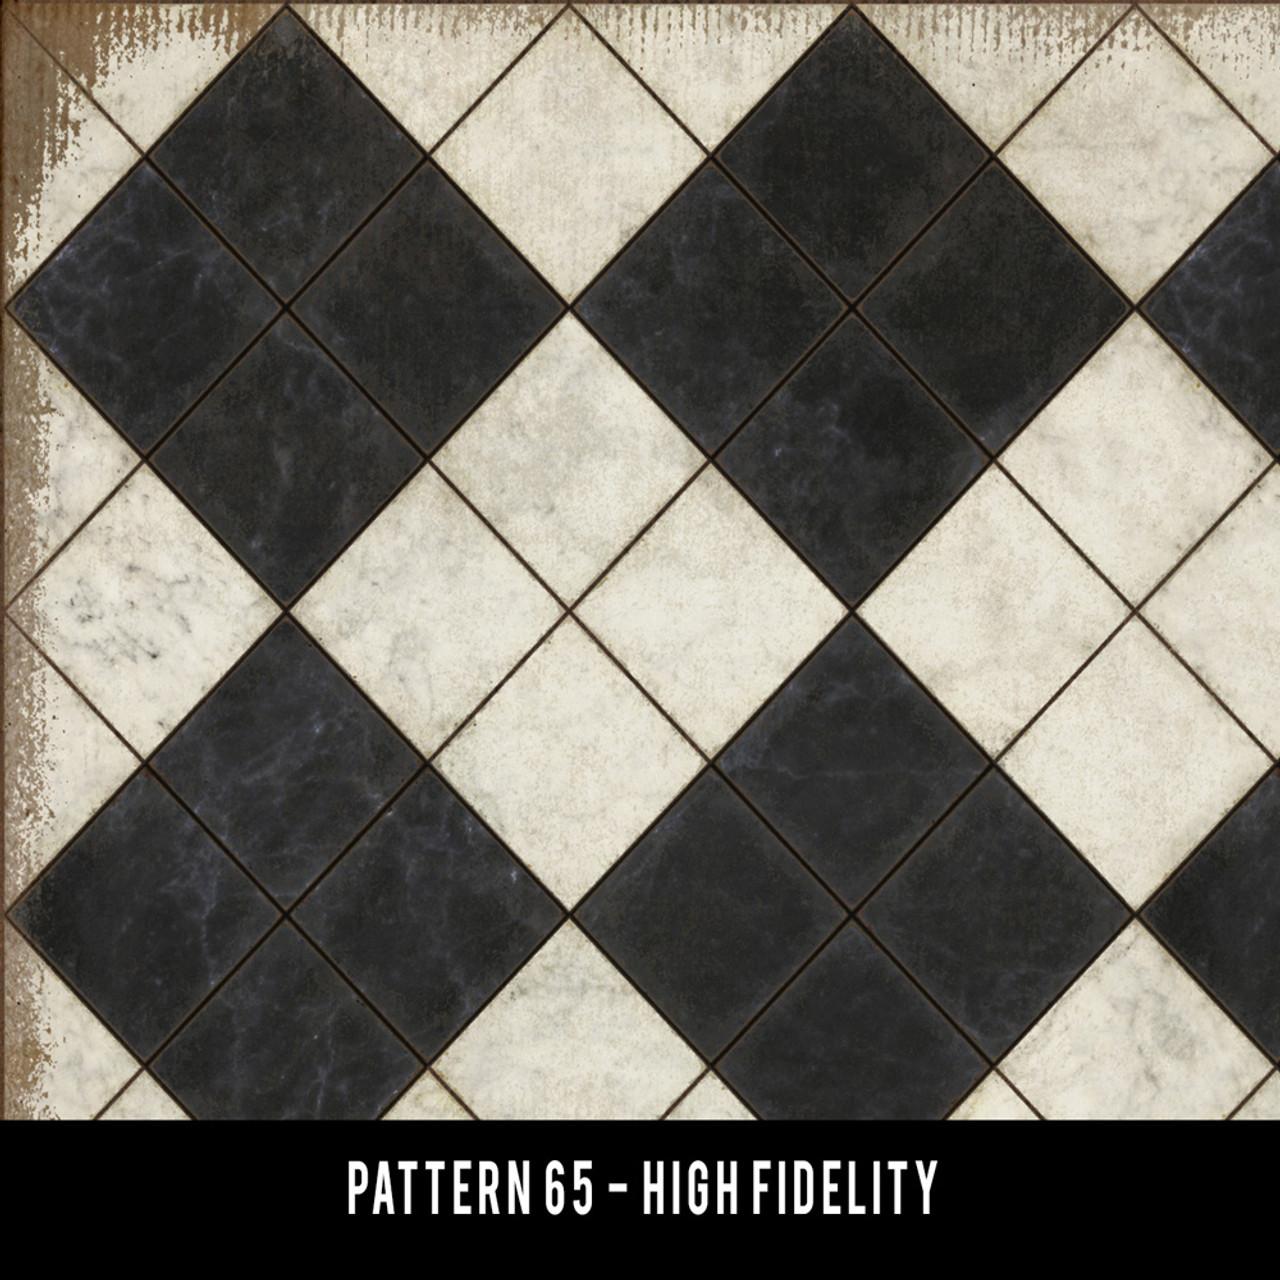 Pattern 65 High Fidelity vinyl floor cloth swatch sample